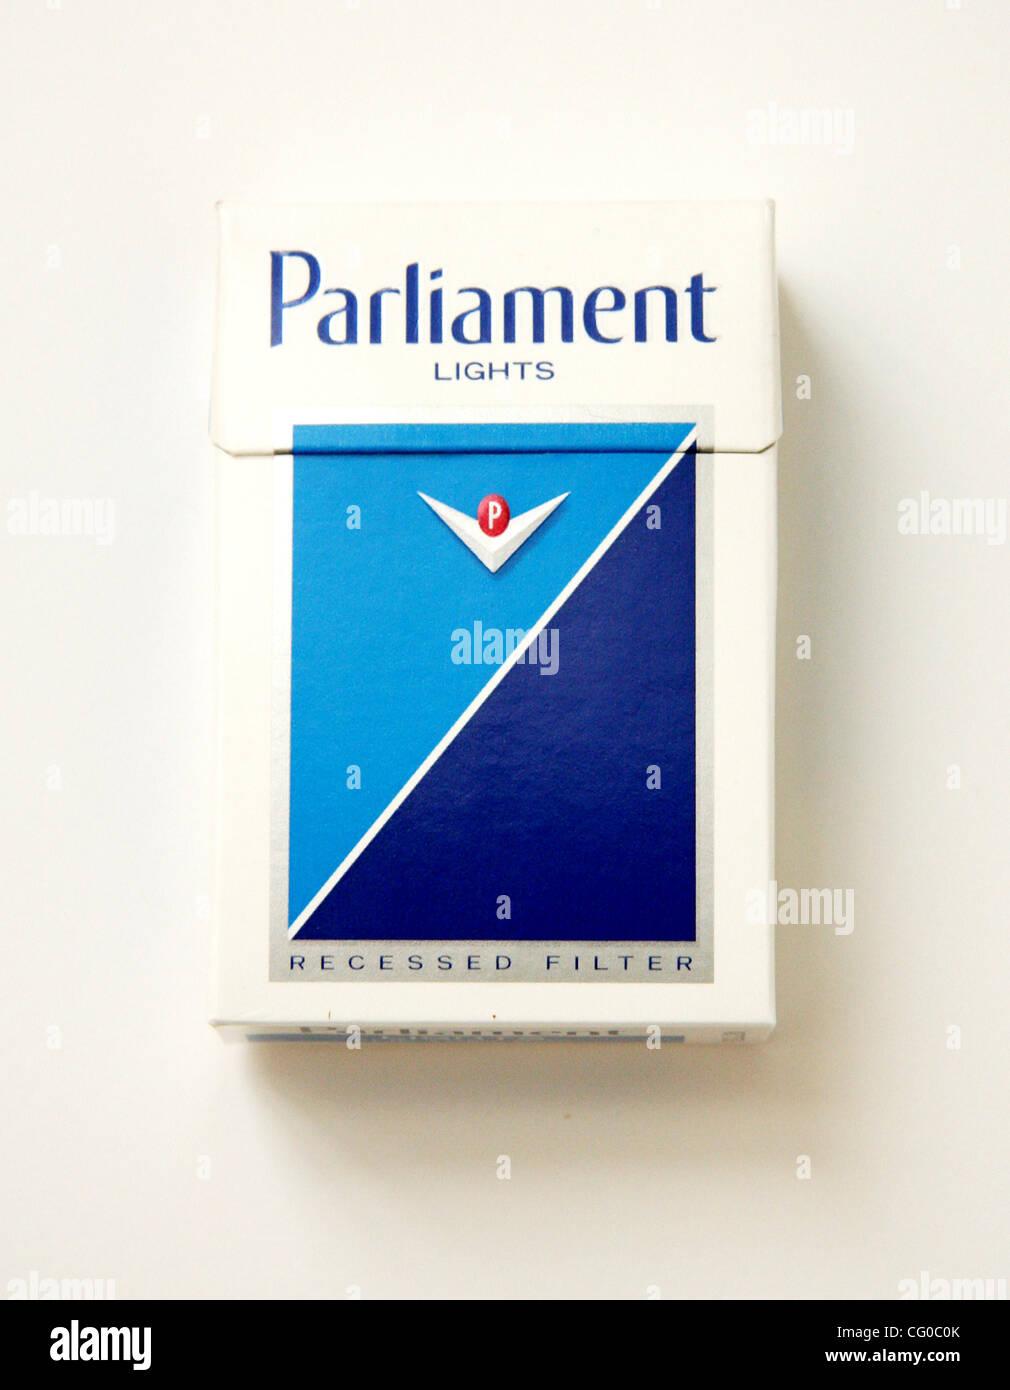 More cigarettes price in France